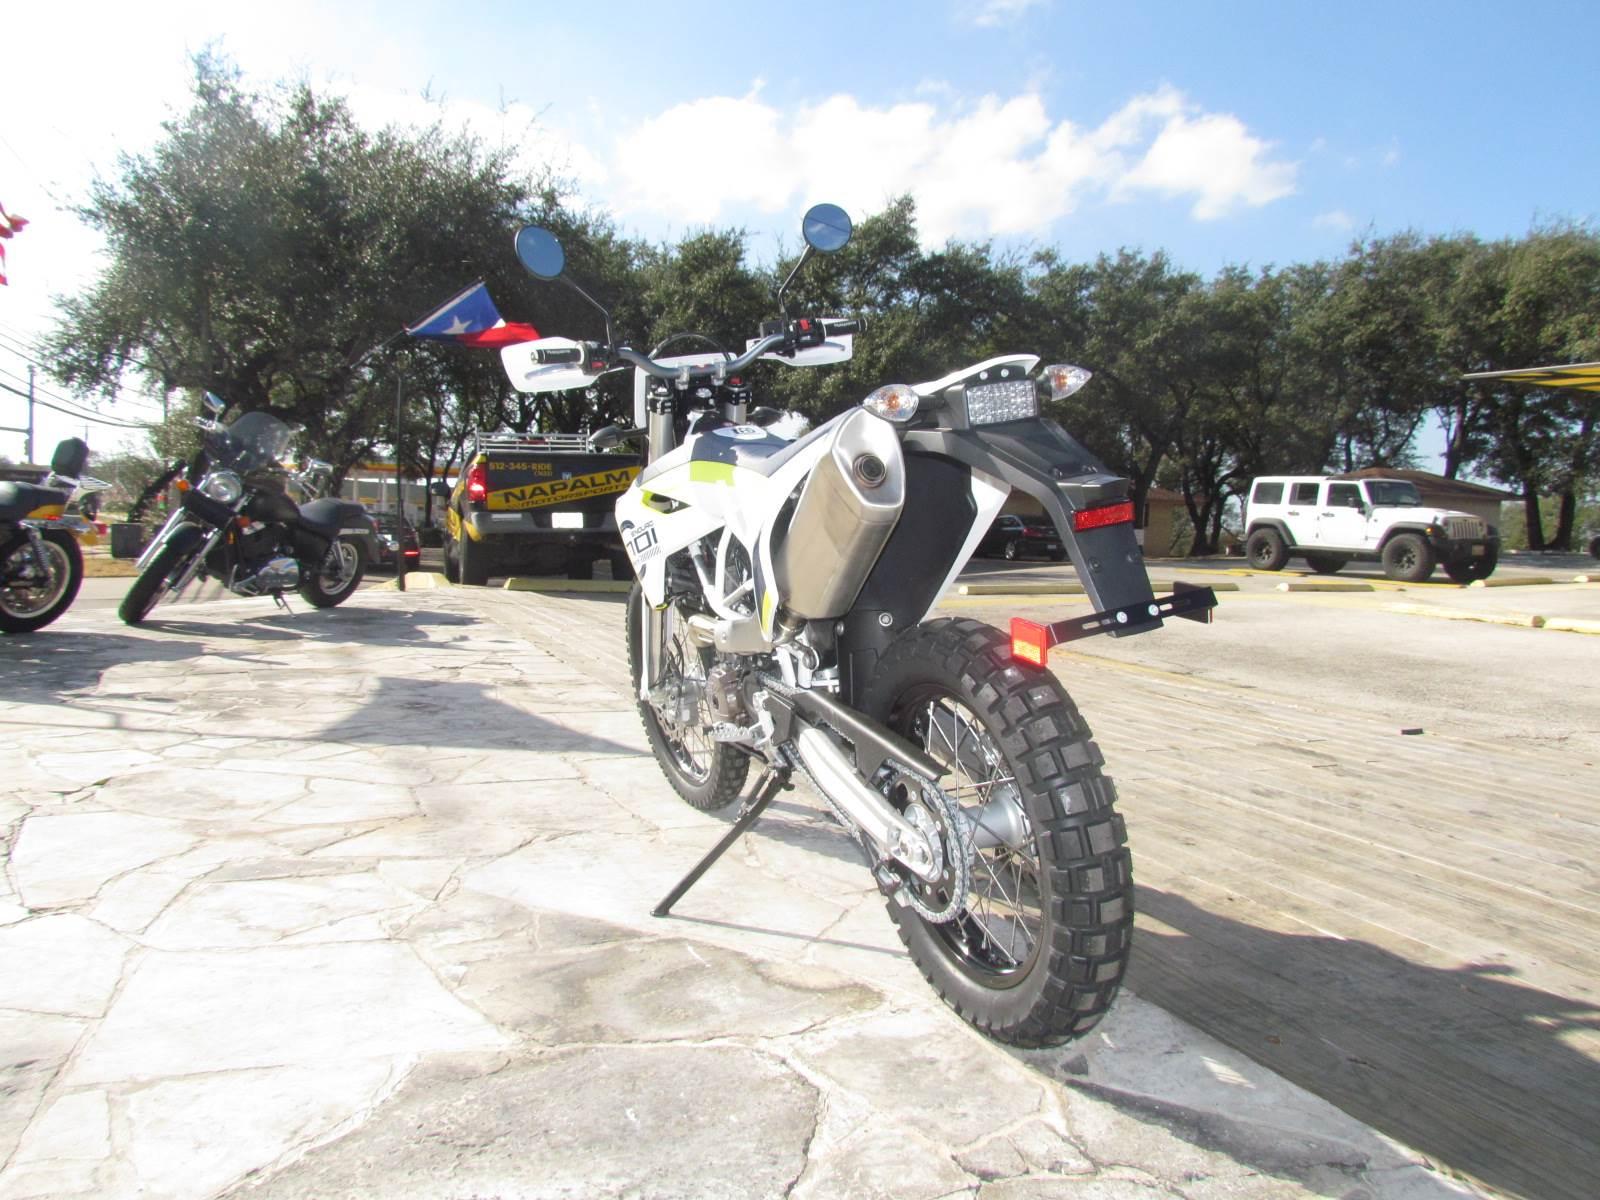 2017 Husqvarna 701 Enduro in Austin, Texas